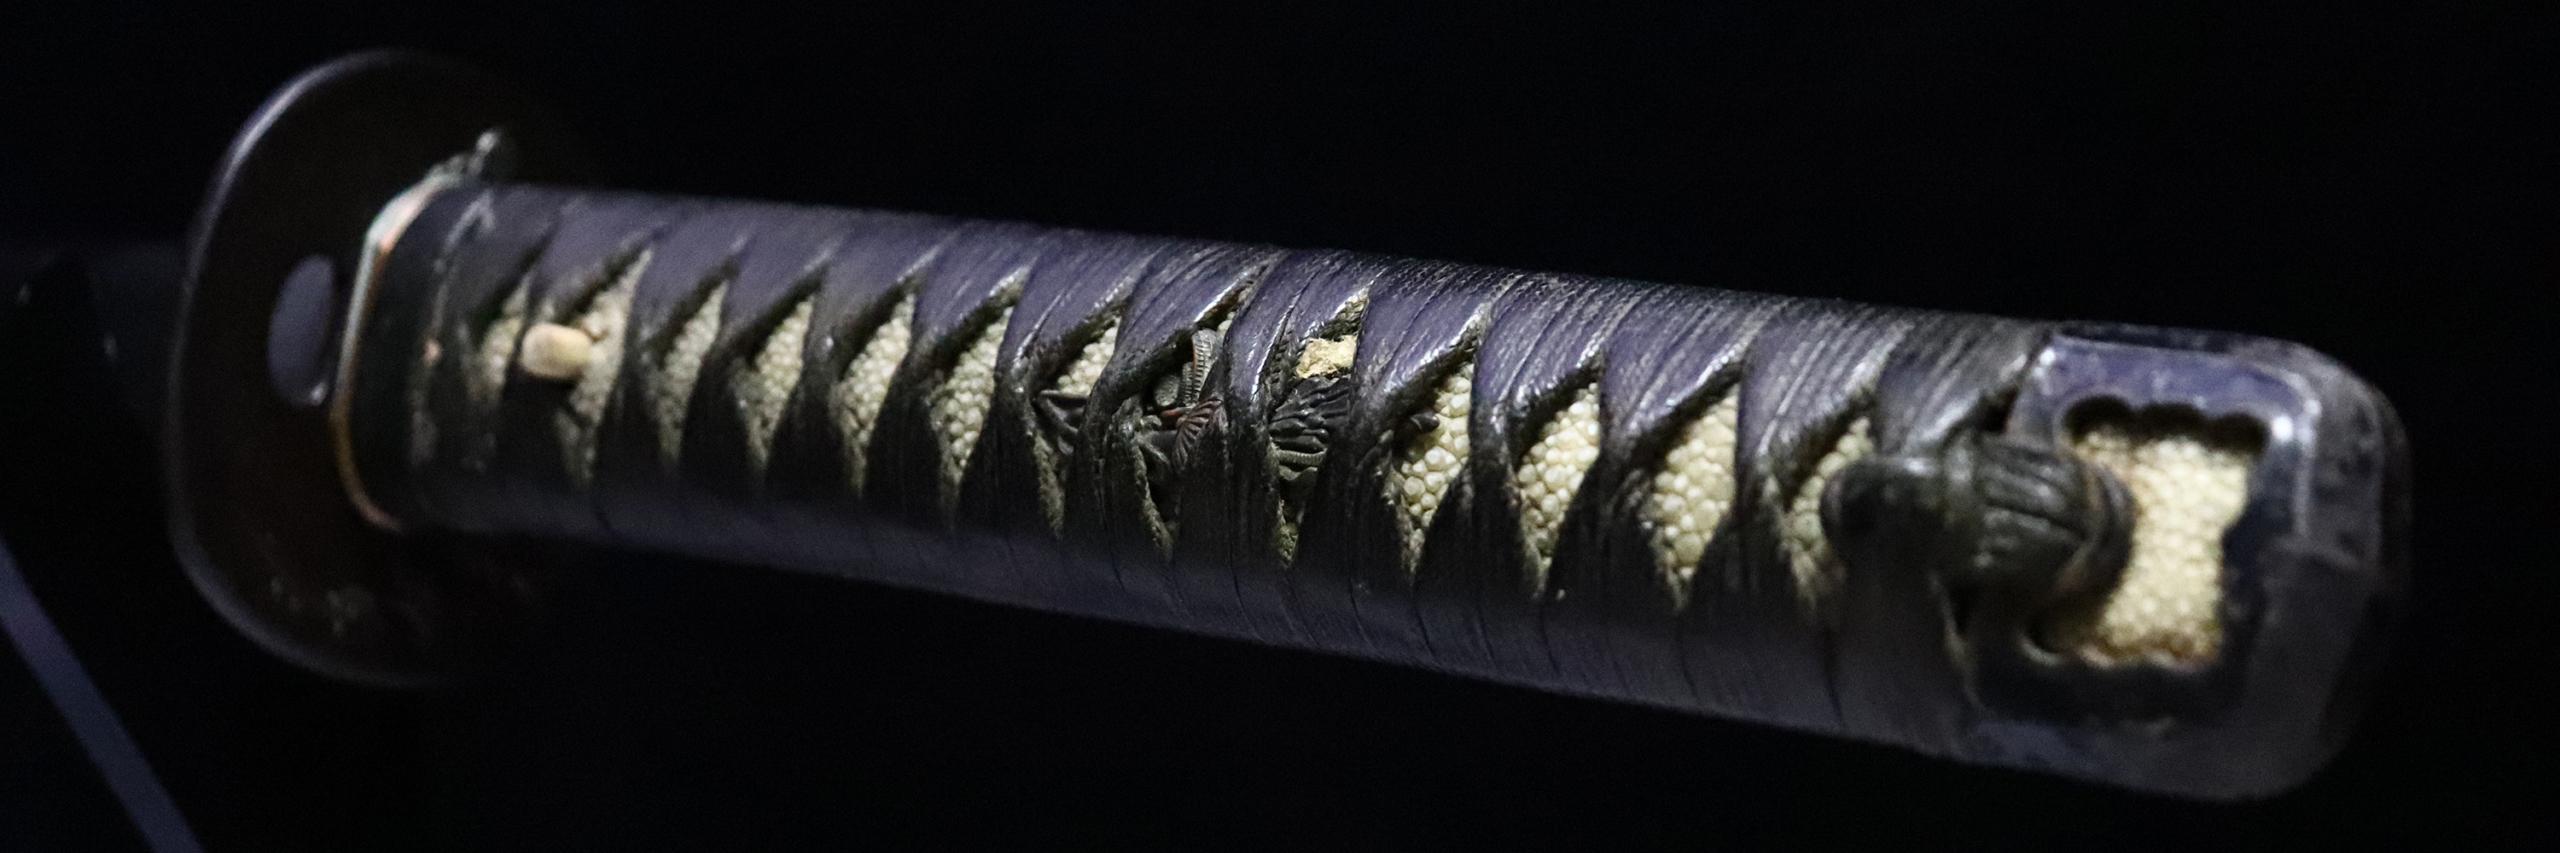 02-3003